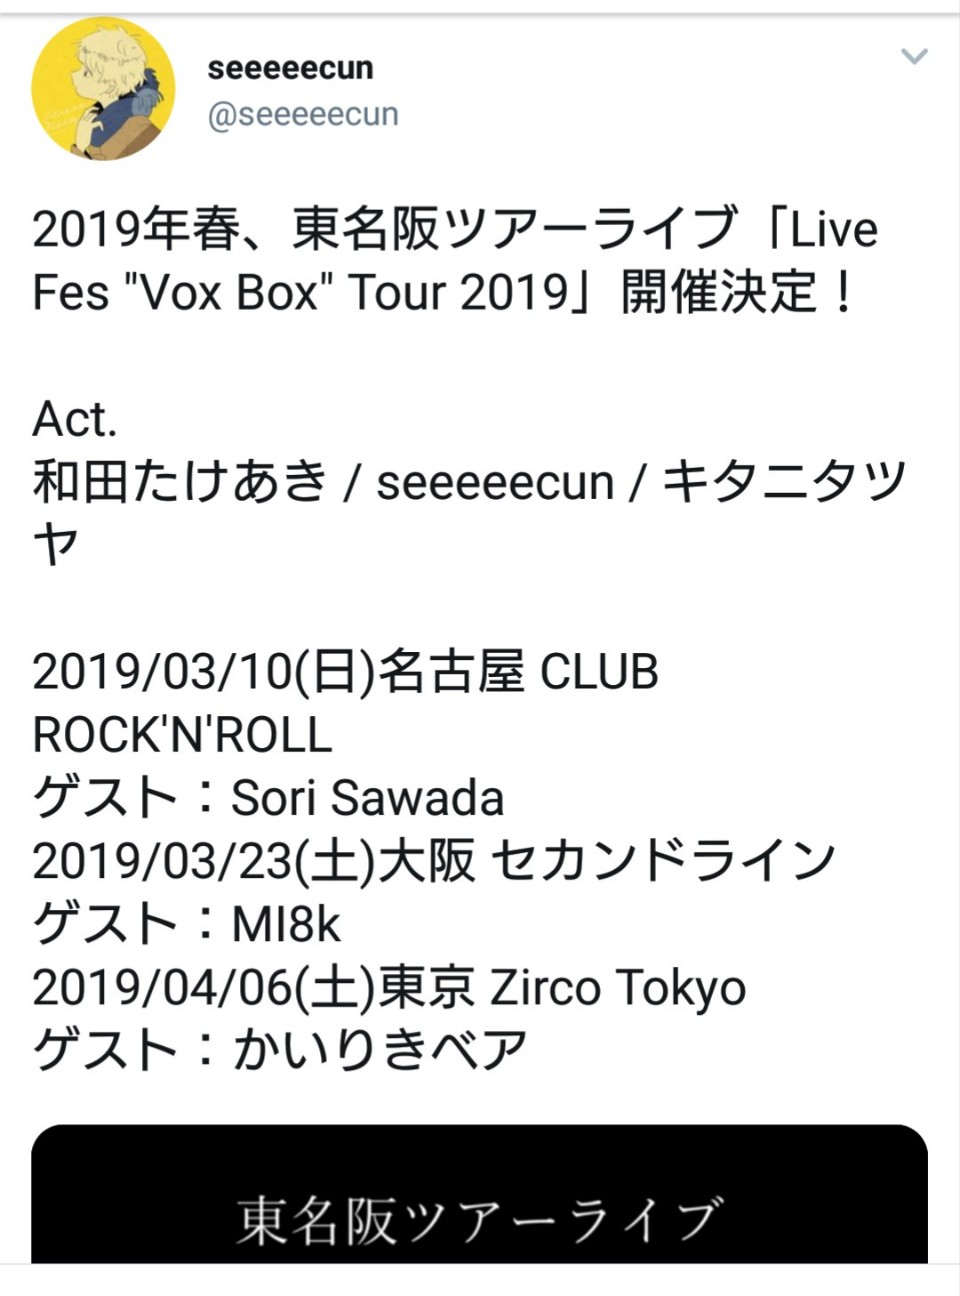 f:id:sakidoriyutsubarock:20190205014848j:plain